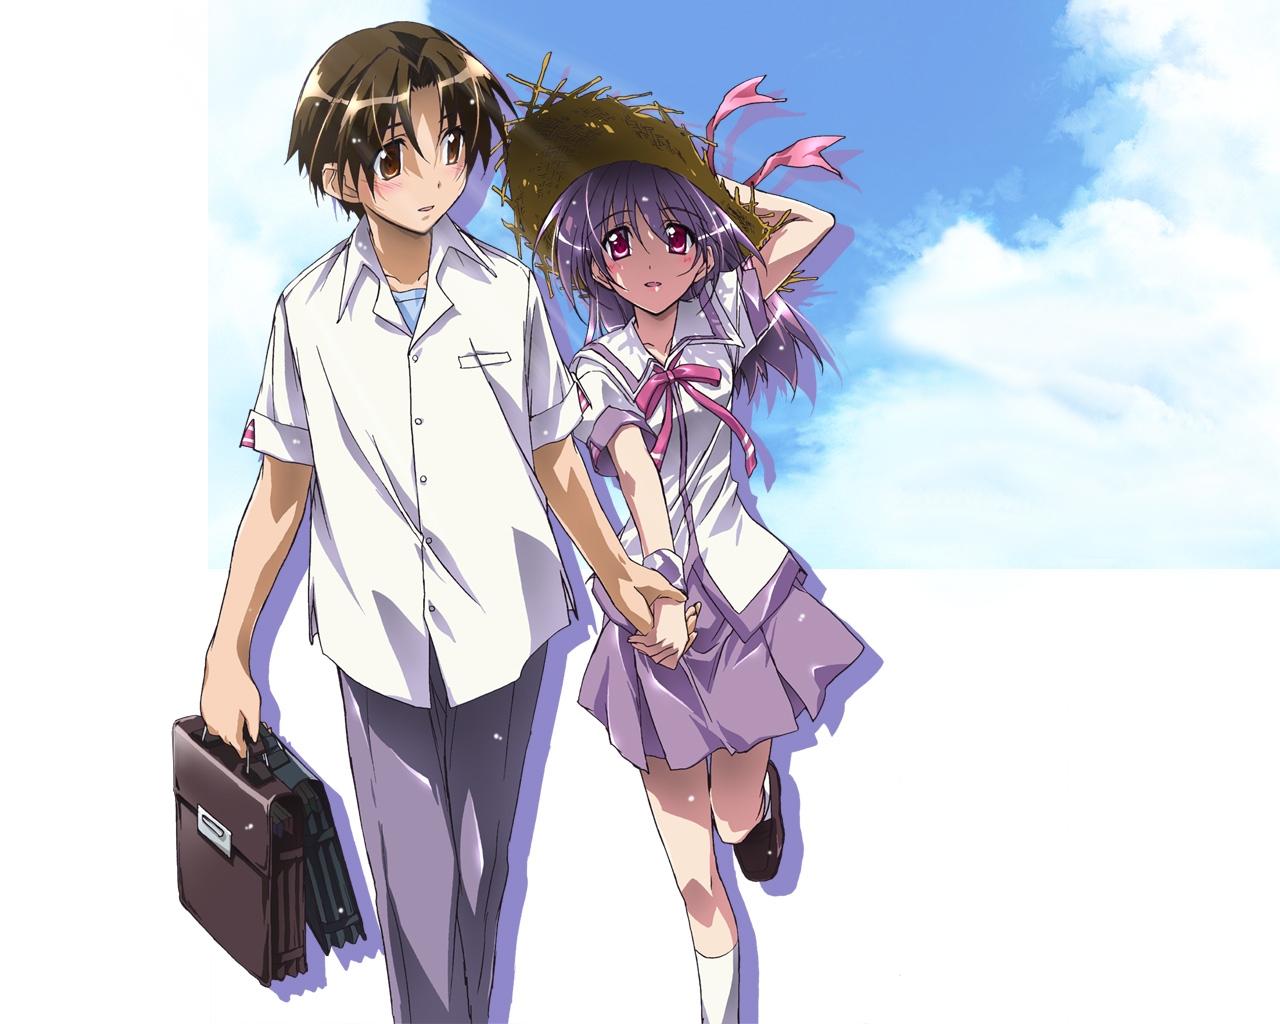 asaba_naoyuki blush brown_eyes brown_hair clouds iriya_kana iriya_no_sora_ufo_no_natsu purple_hair red_eyes school_uniform short_hair